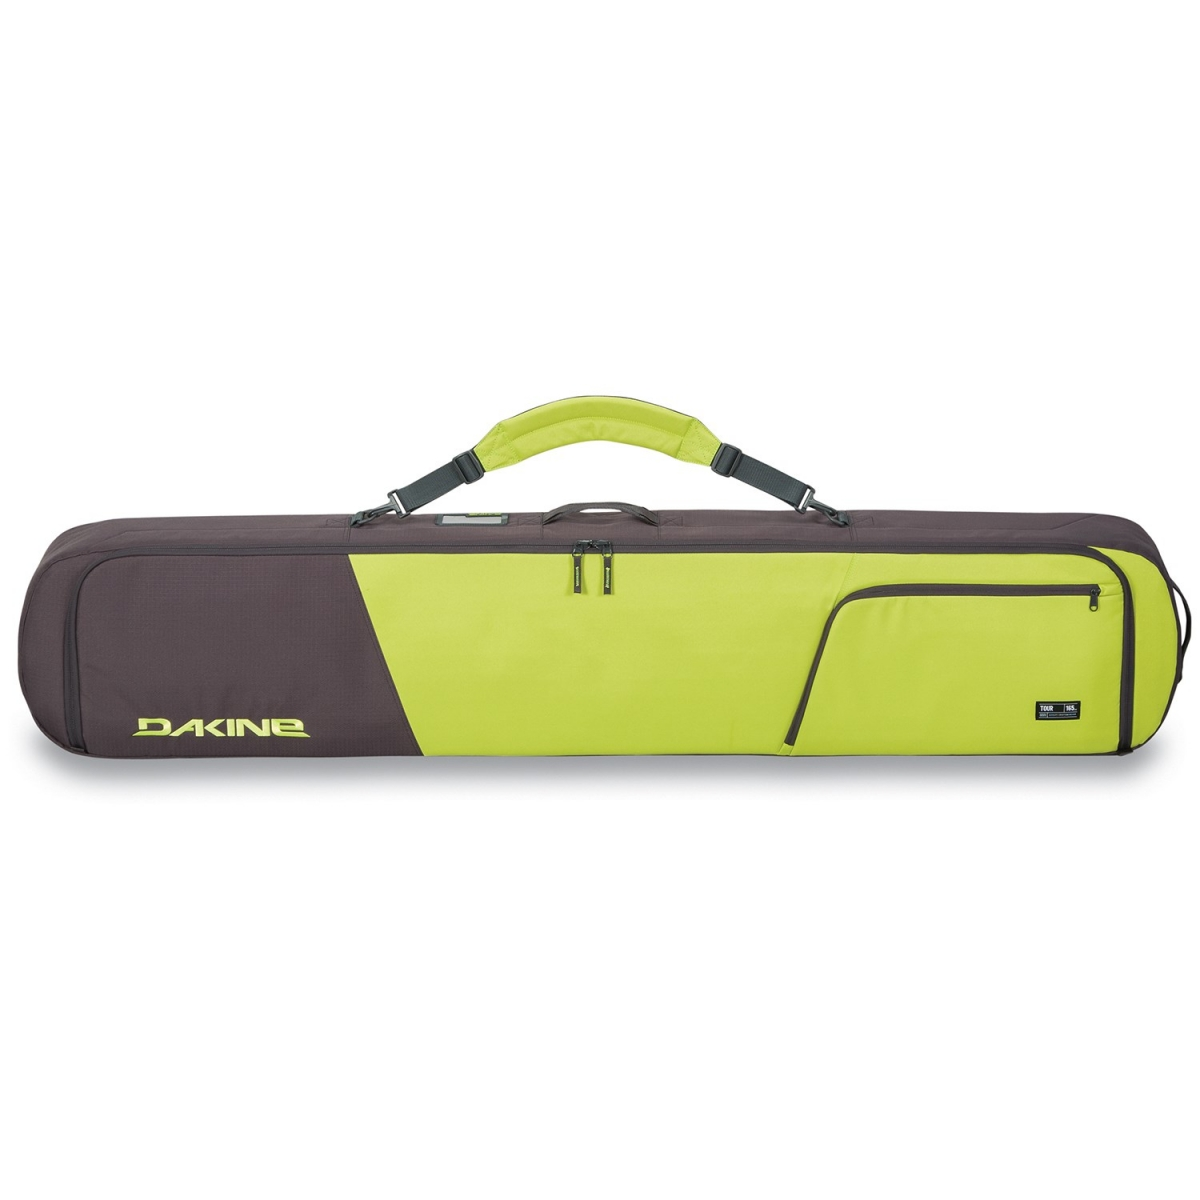 f909e7acb3fd Купить чехол для сноуборда DAKINE TOUR SNOWBOARD BAG 157 DARK CITRON ...